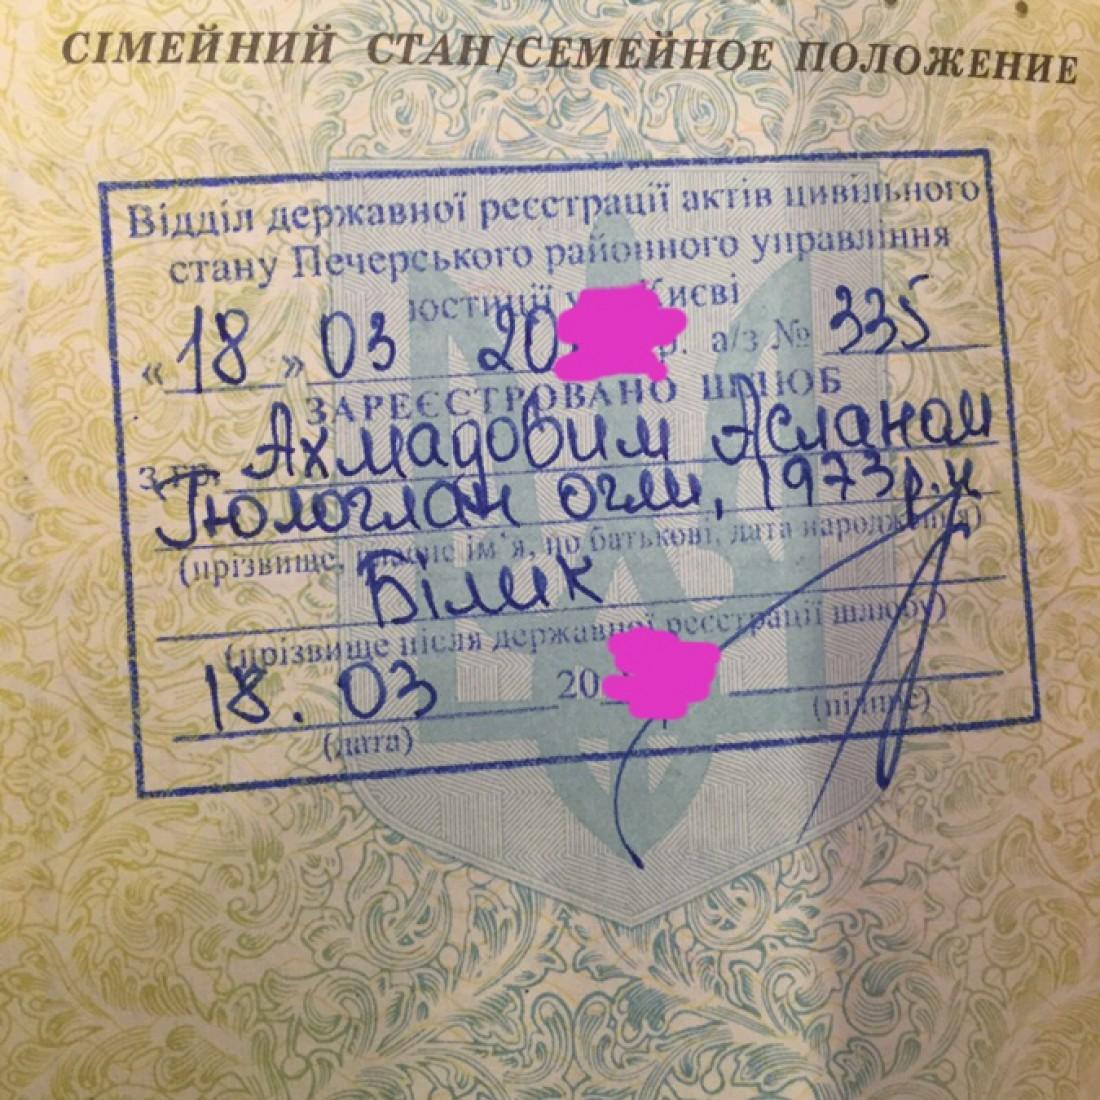 Штамп в паспорте Ирины Билык